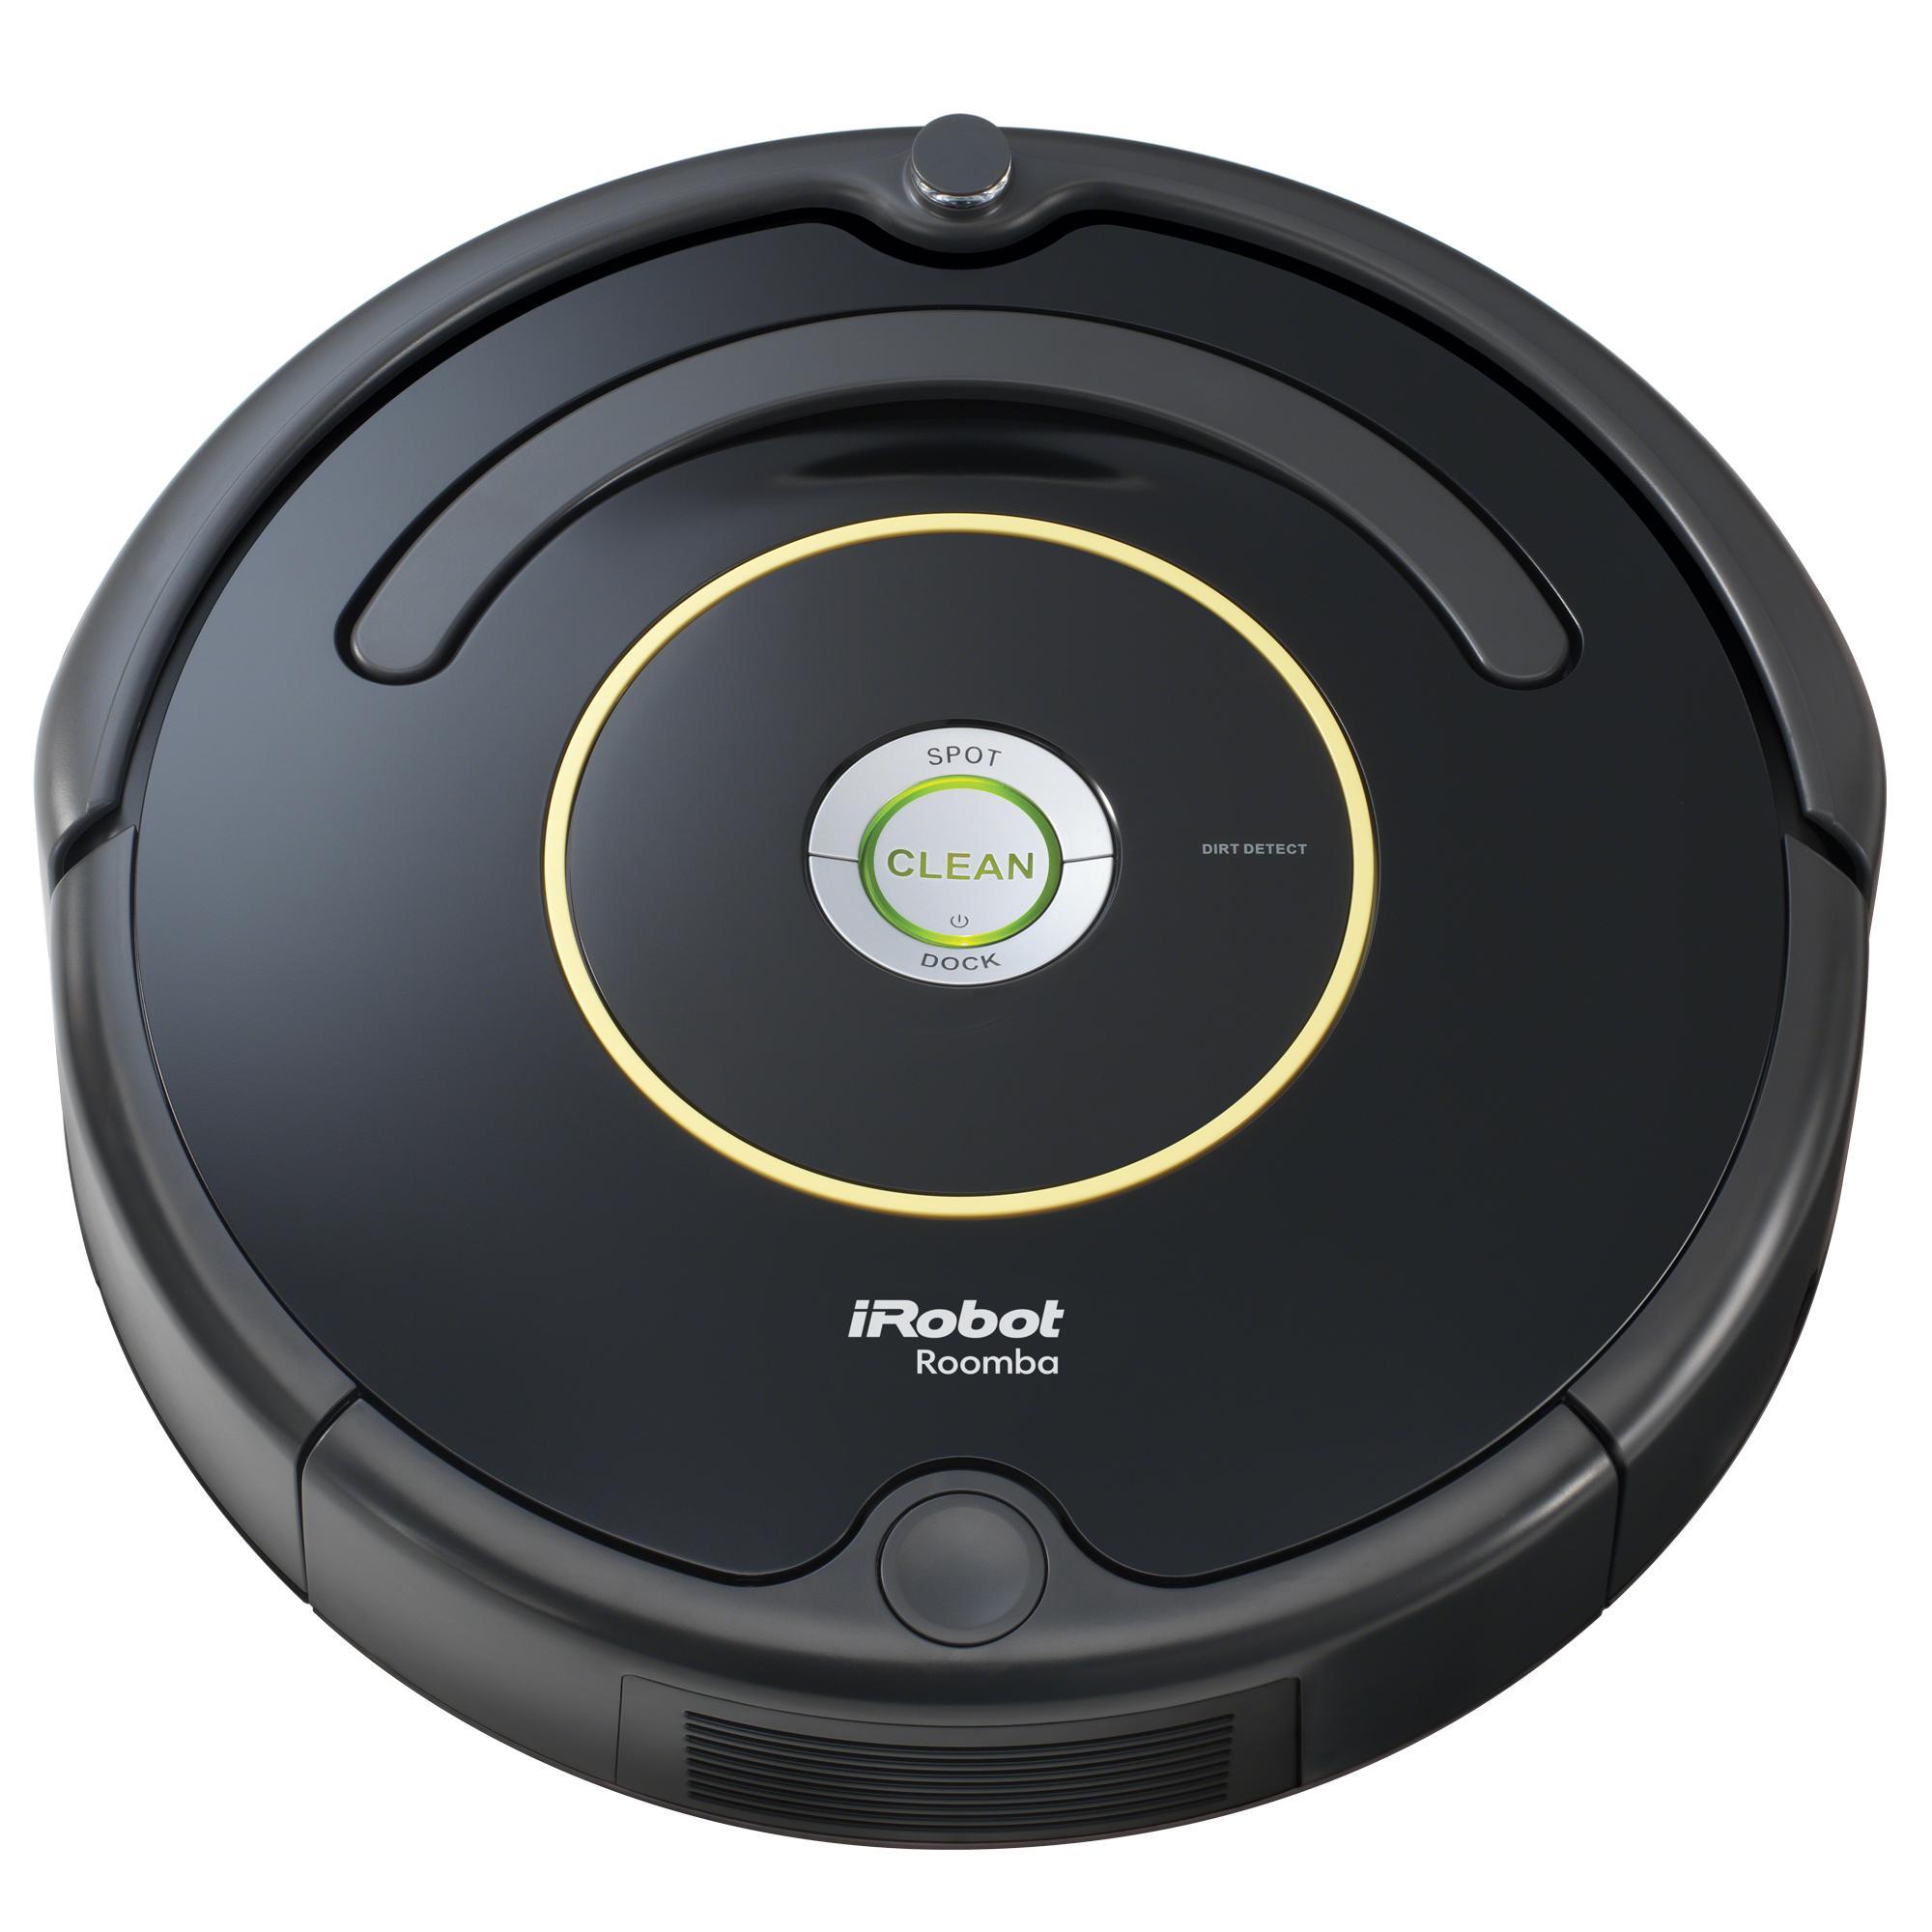 irobot roomba 614 robot vacuum home kitchen. Black Bedroom Furniture Sets. Home Design Ideas